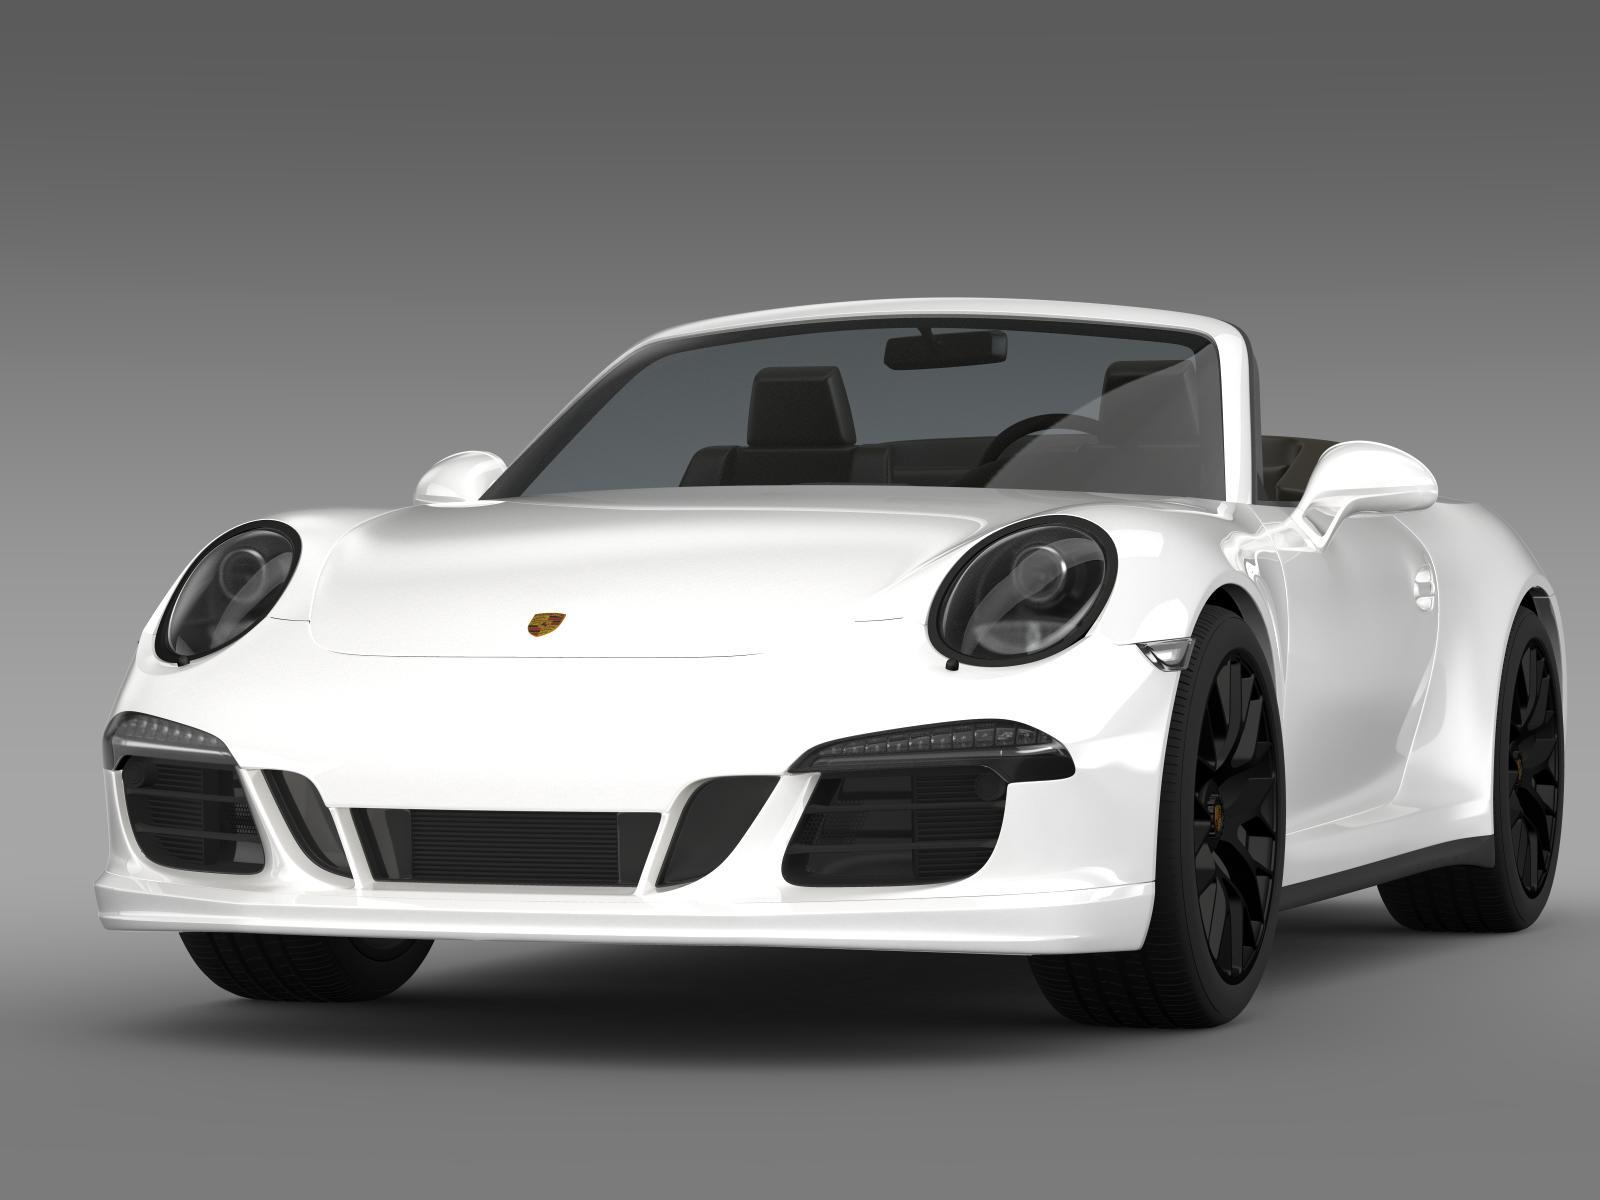 porsche 911 carrera 4 gts cabriolet 991 2015 3d model buy porsche 911 carrera 4 gts cabriolet. Black Bedroom Furniture Sets. Home Design Ideas